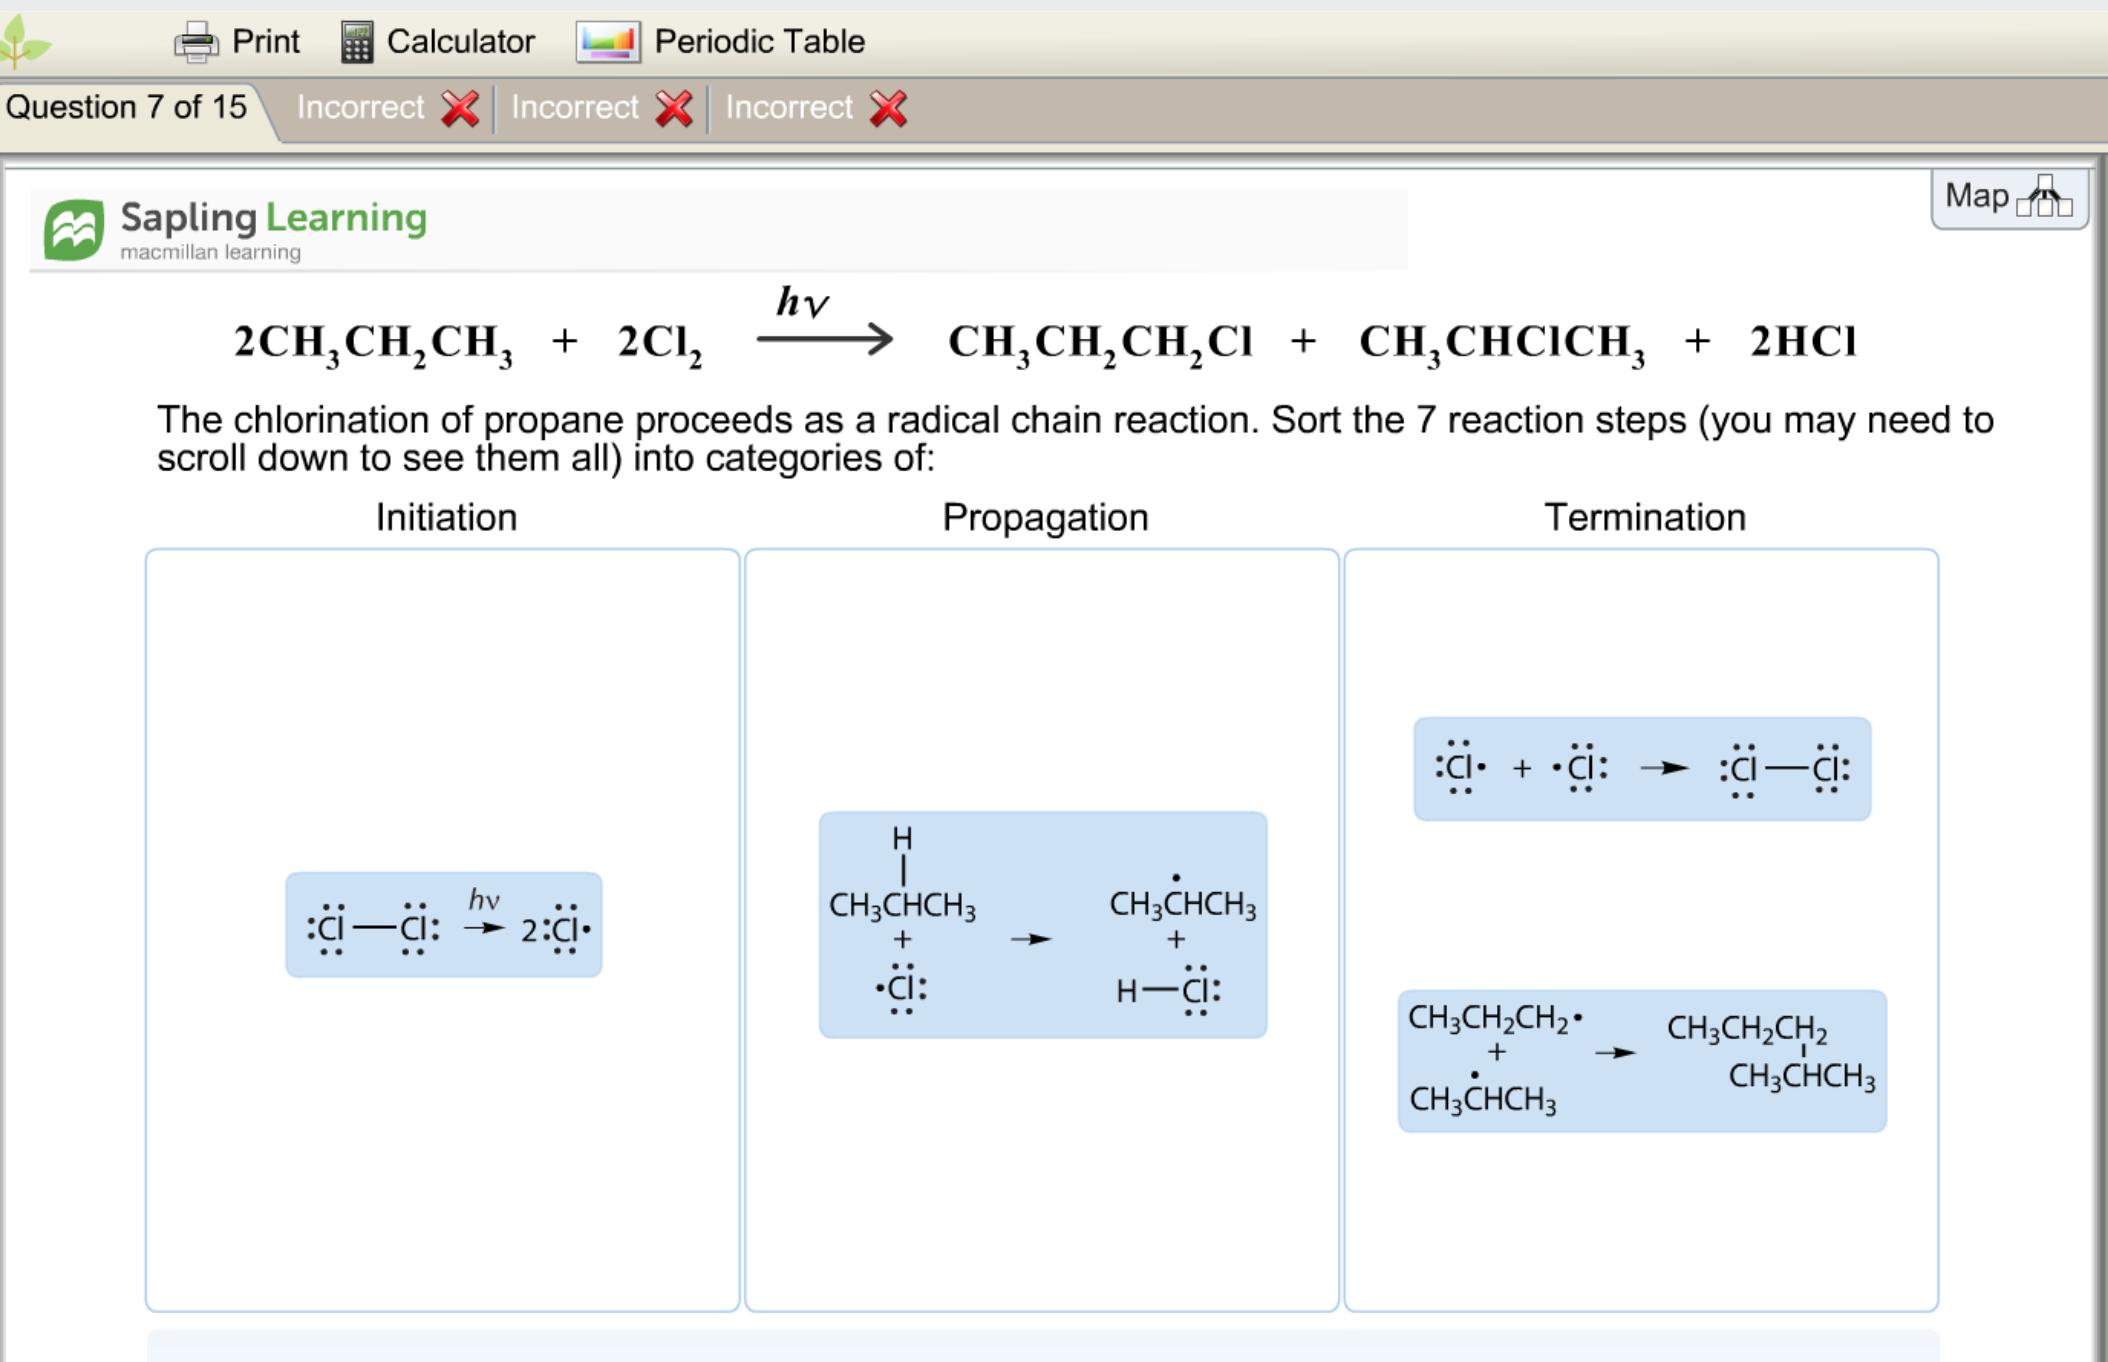 Print calculator periodic table incorrect incorrec chegg print calculator periodic table incorrect incorrec urtaz Gallery